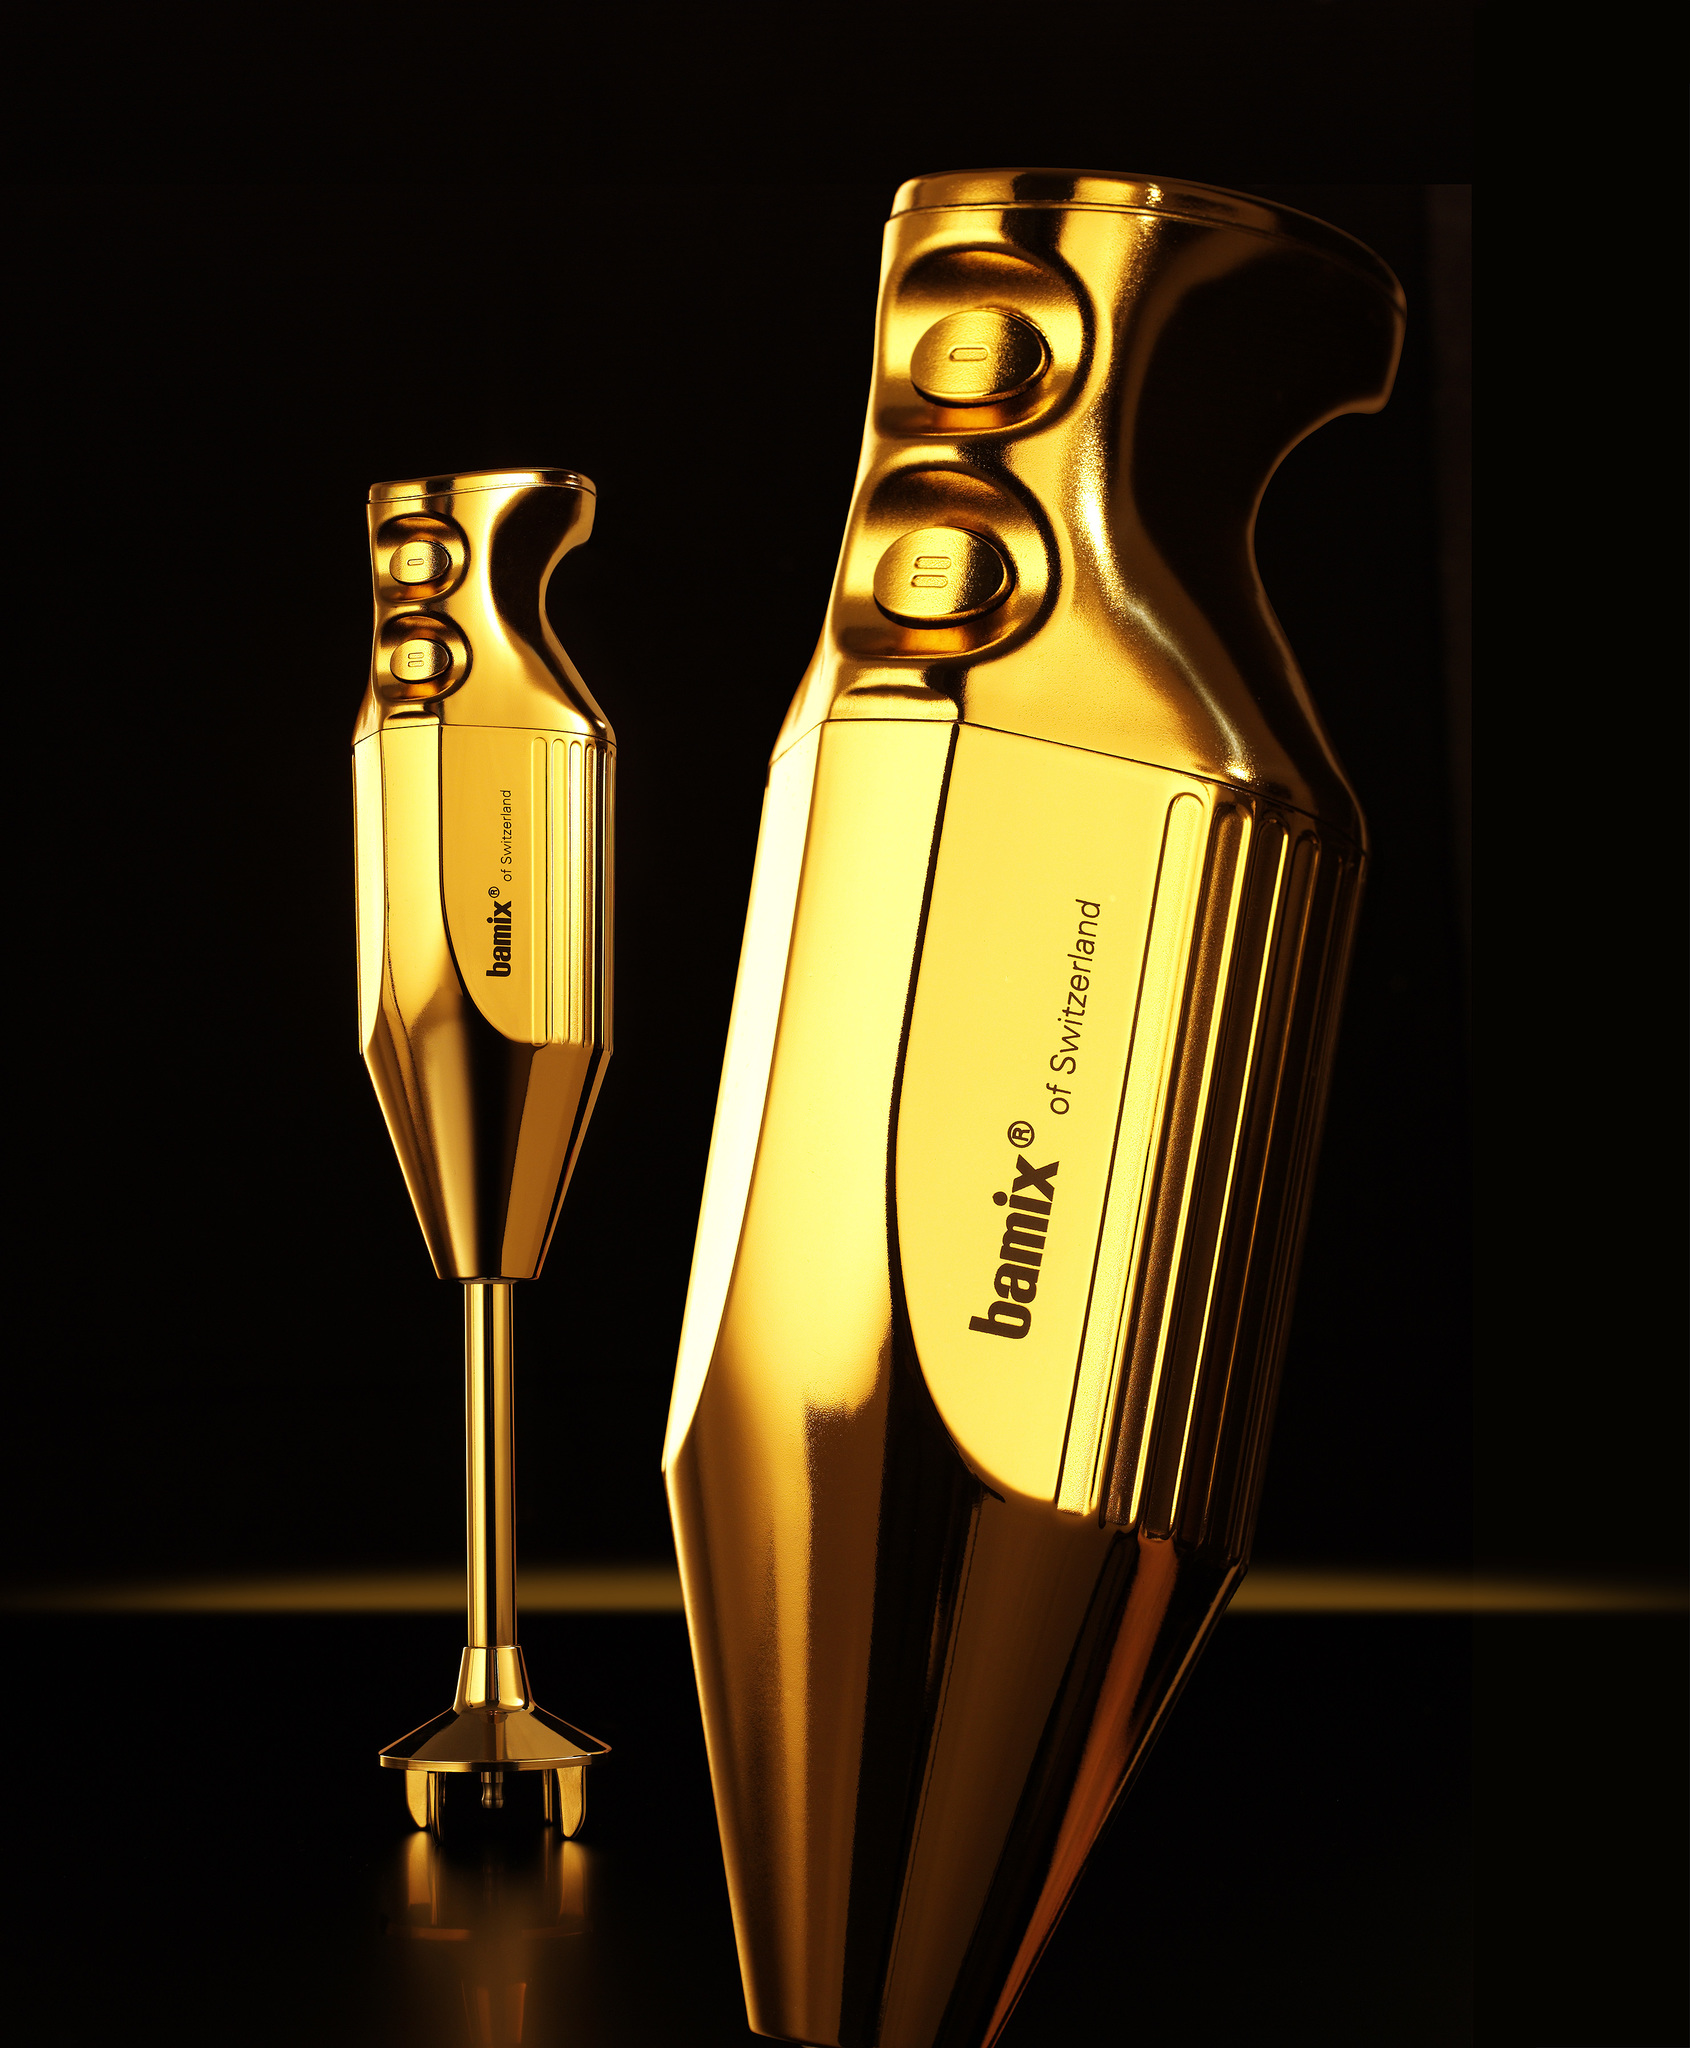 Блендер Bamix LuxuryLine M200 Gold Queen